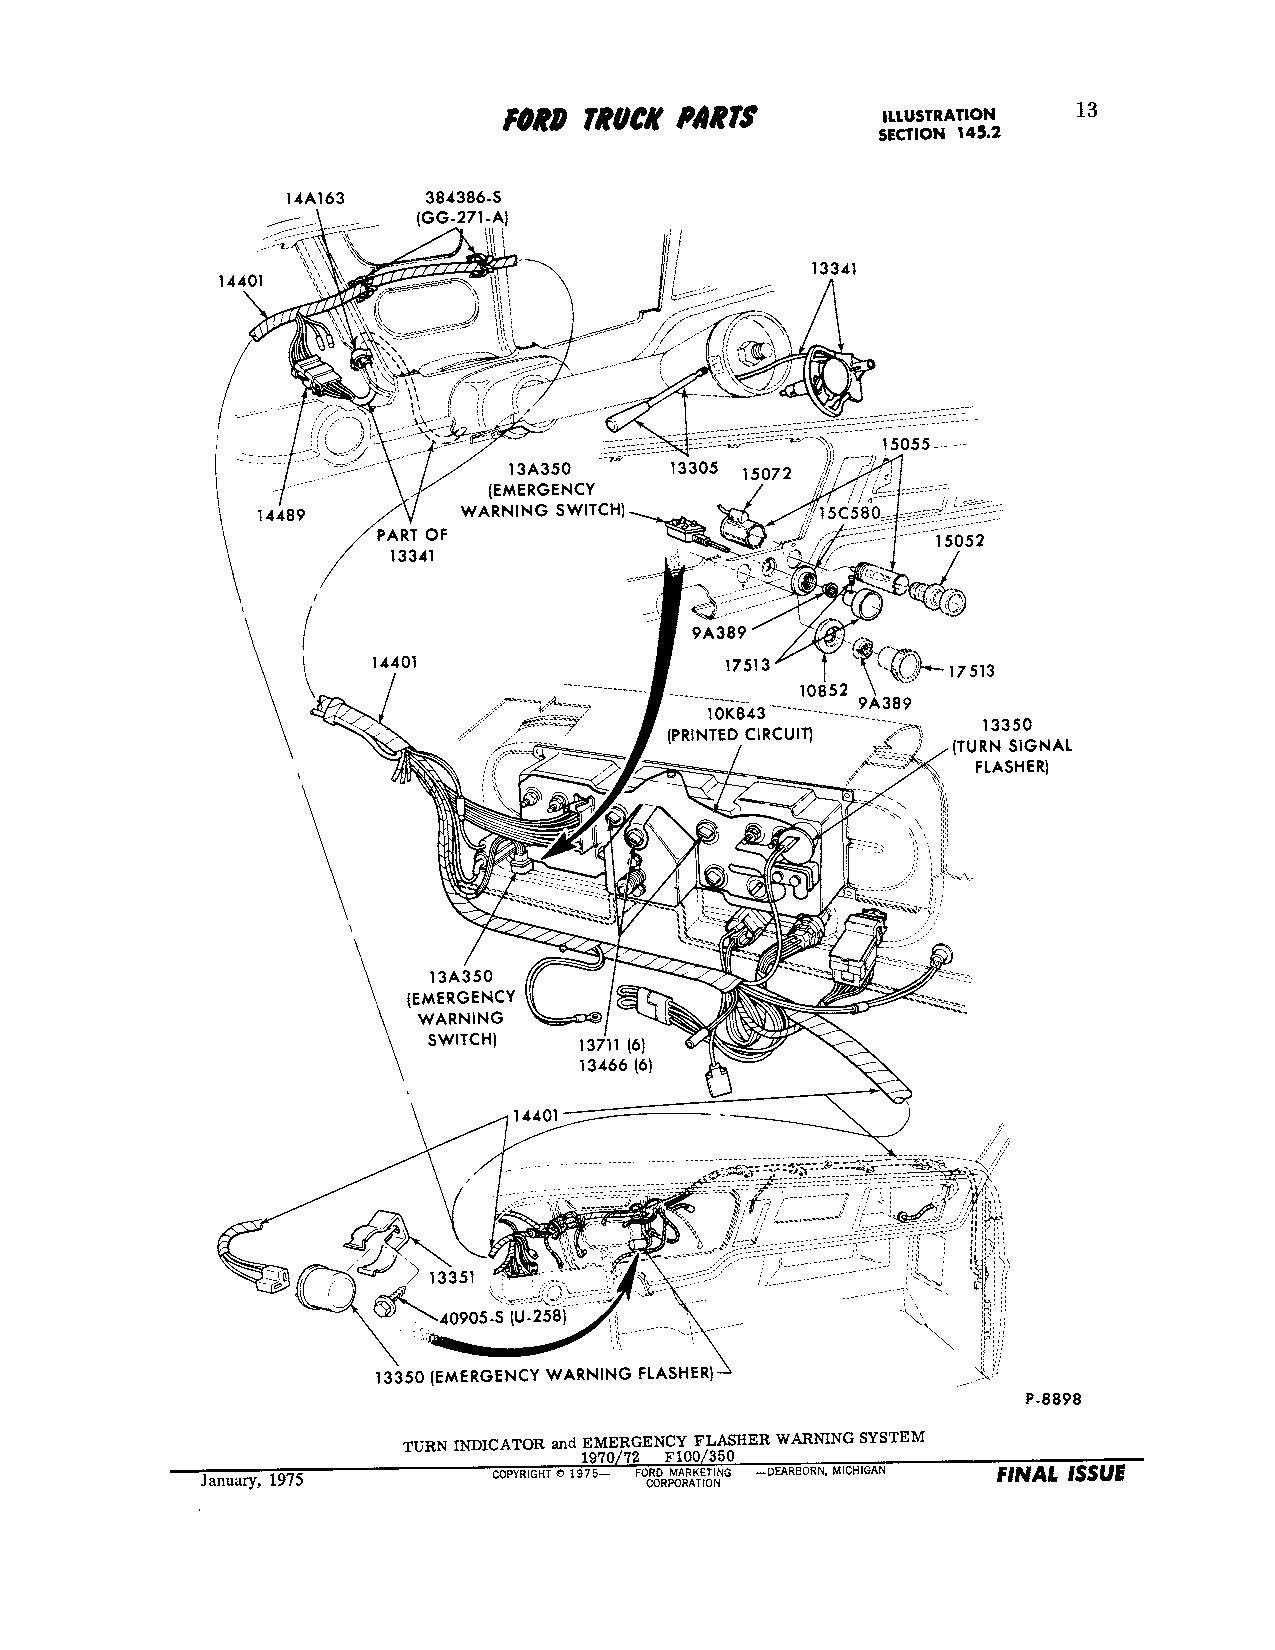 Steering Column Wiring Question